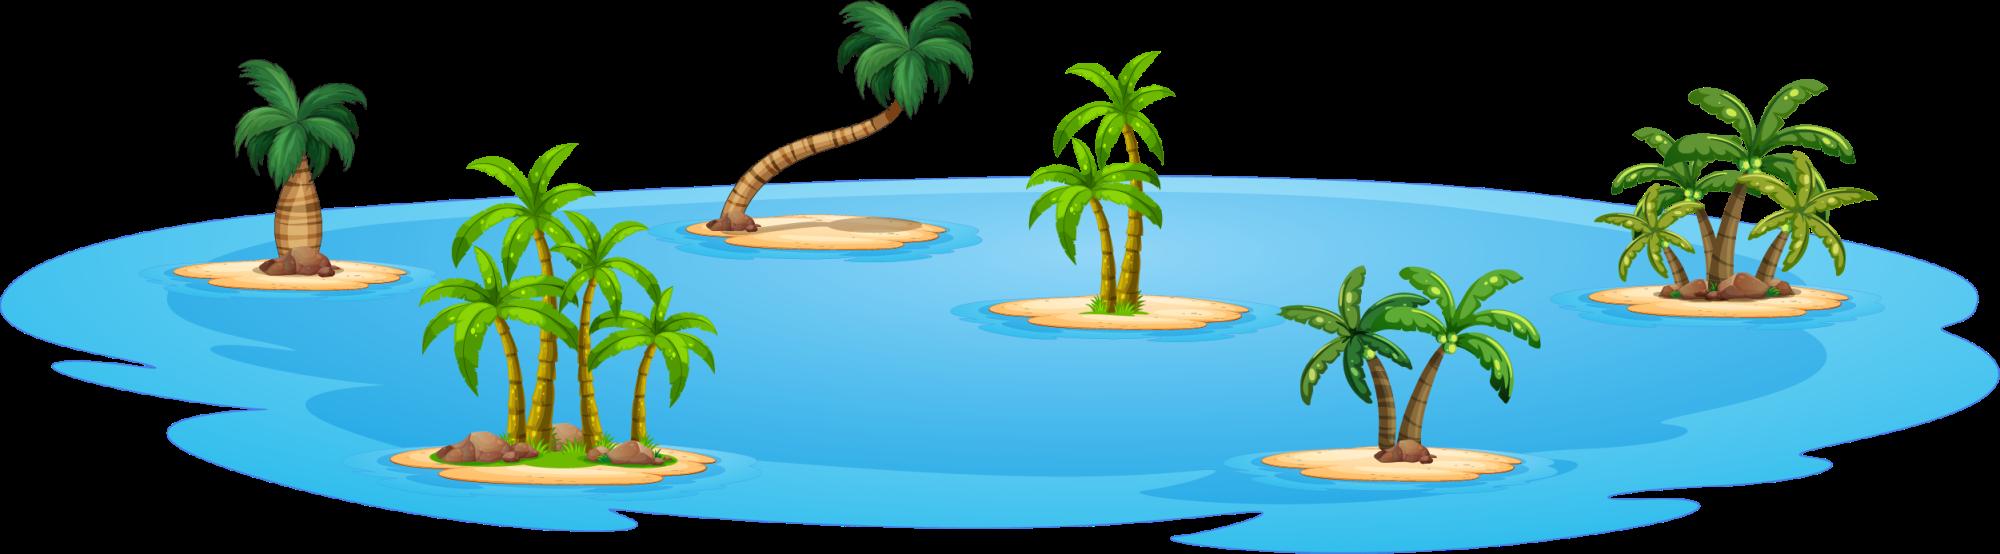 Island cartoon photography illustration. Ocean clipart blue ocean